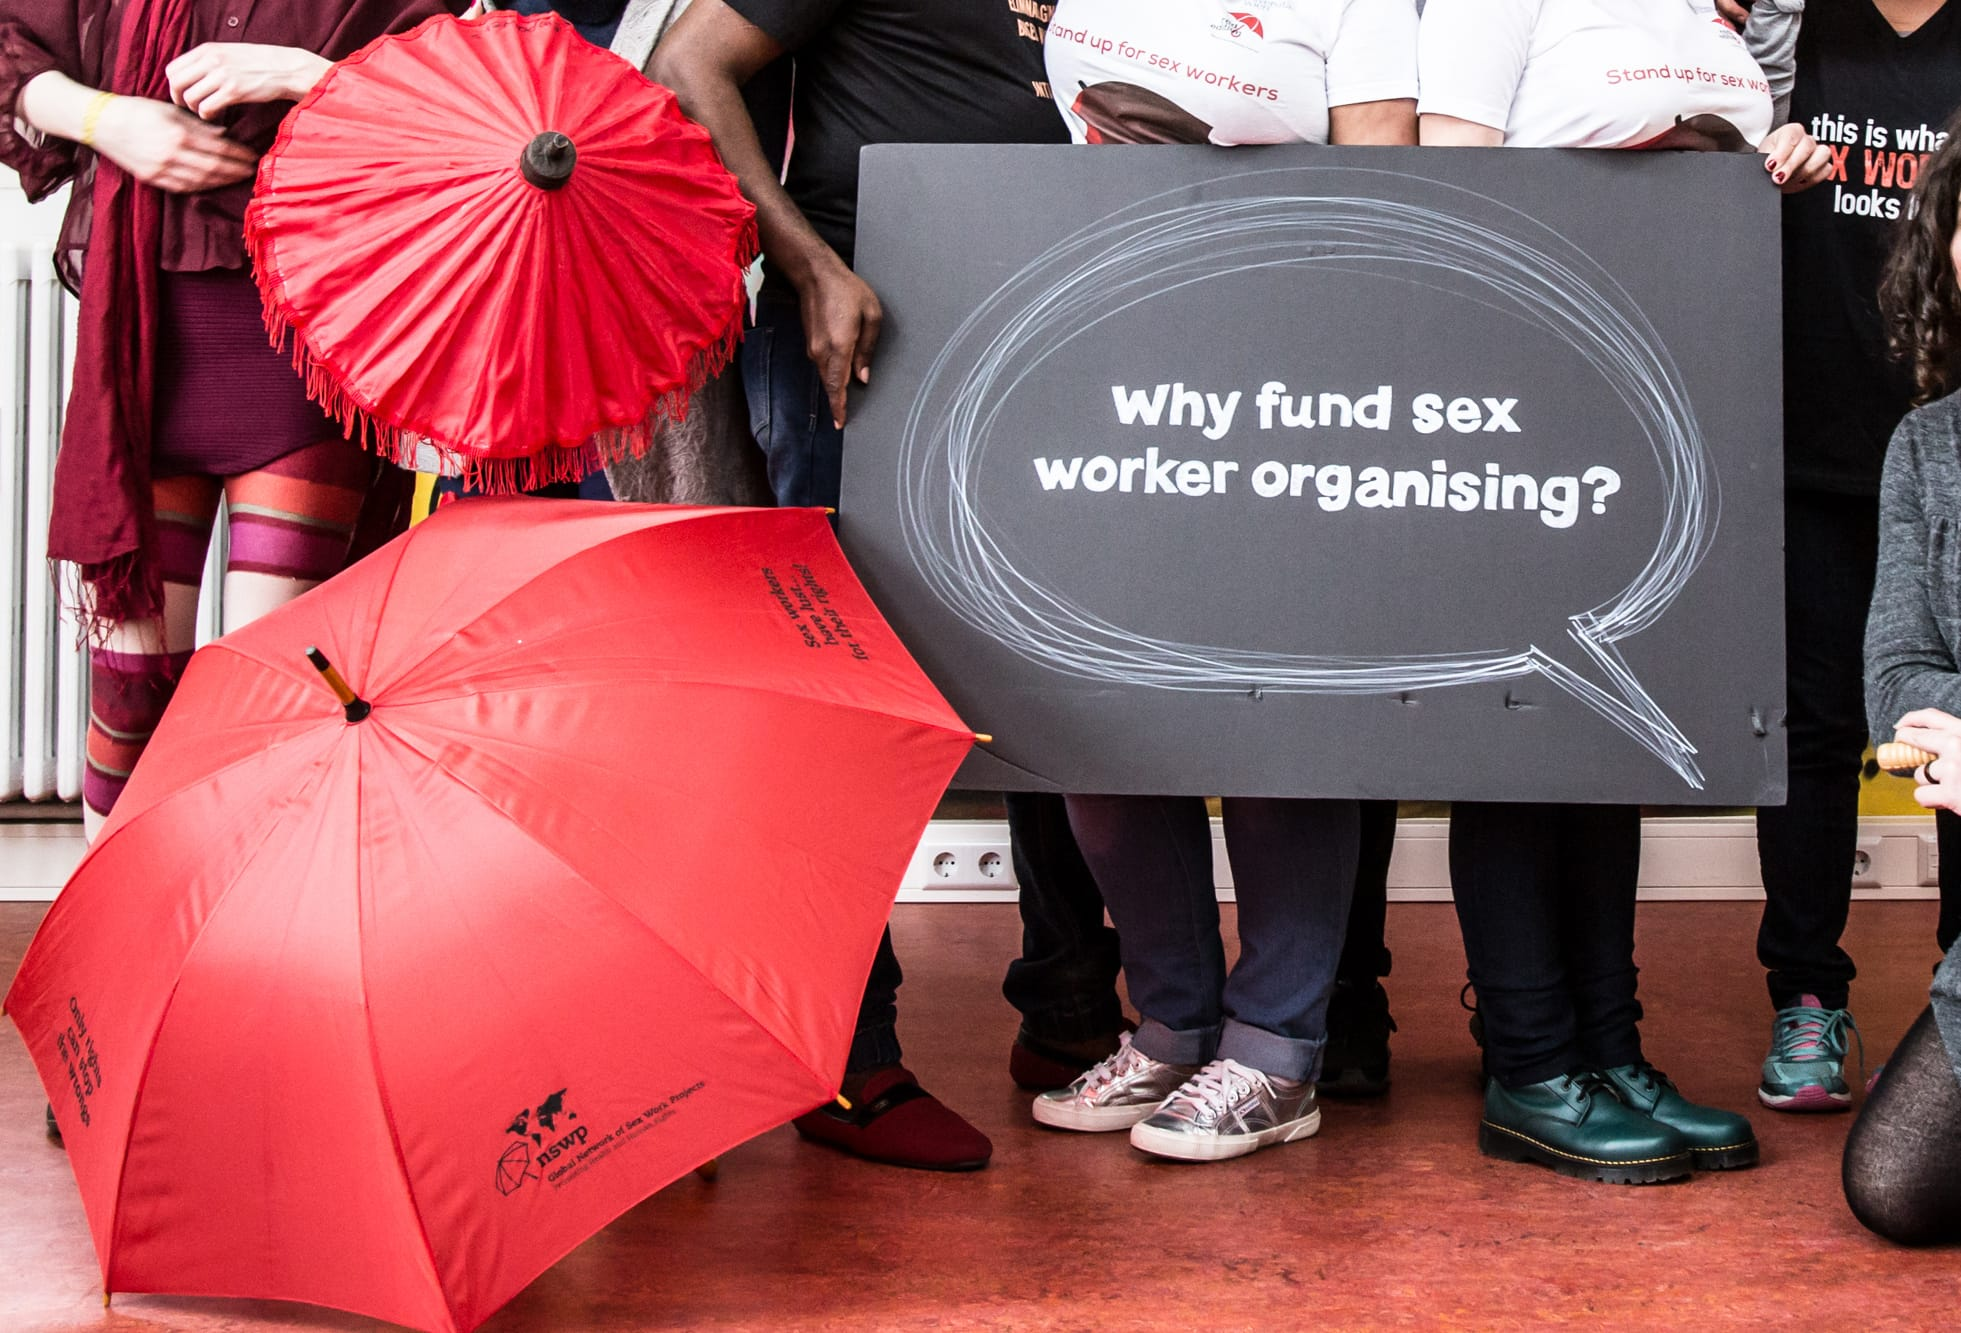 Blog - Page 3 of 4 - Red Umbrella Fund